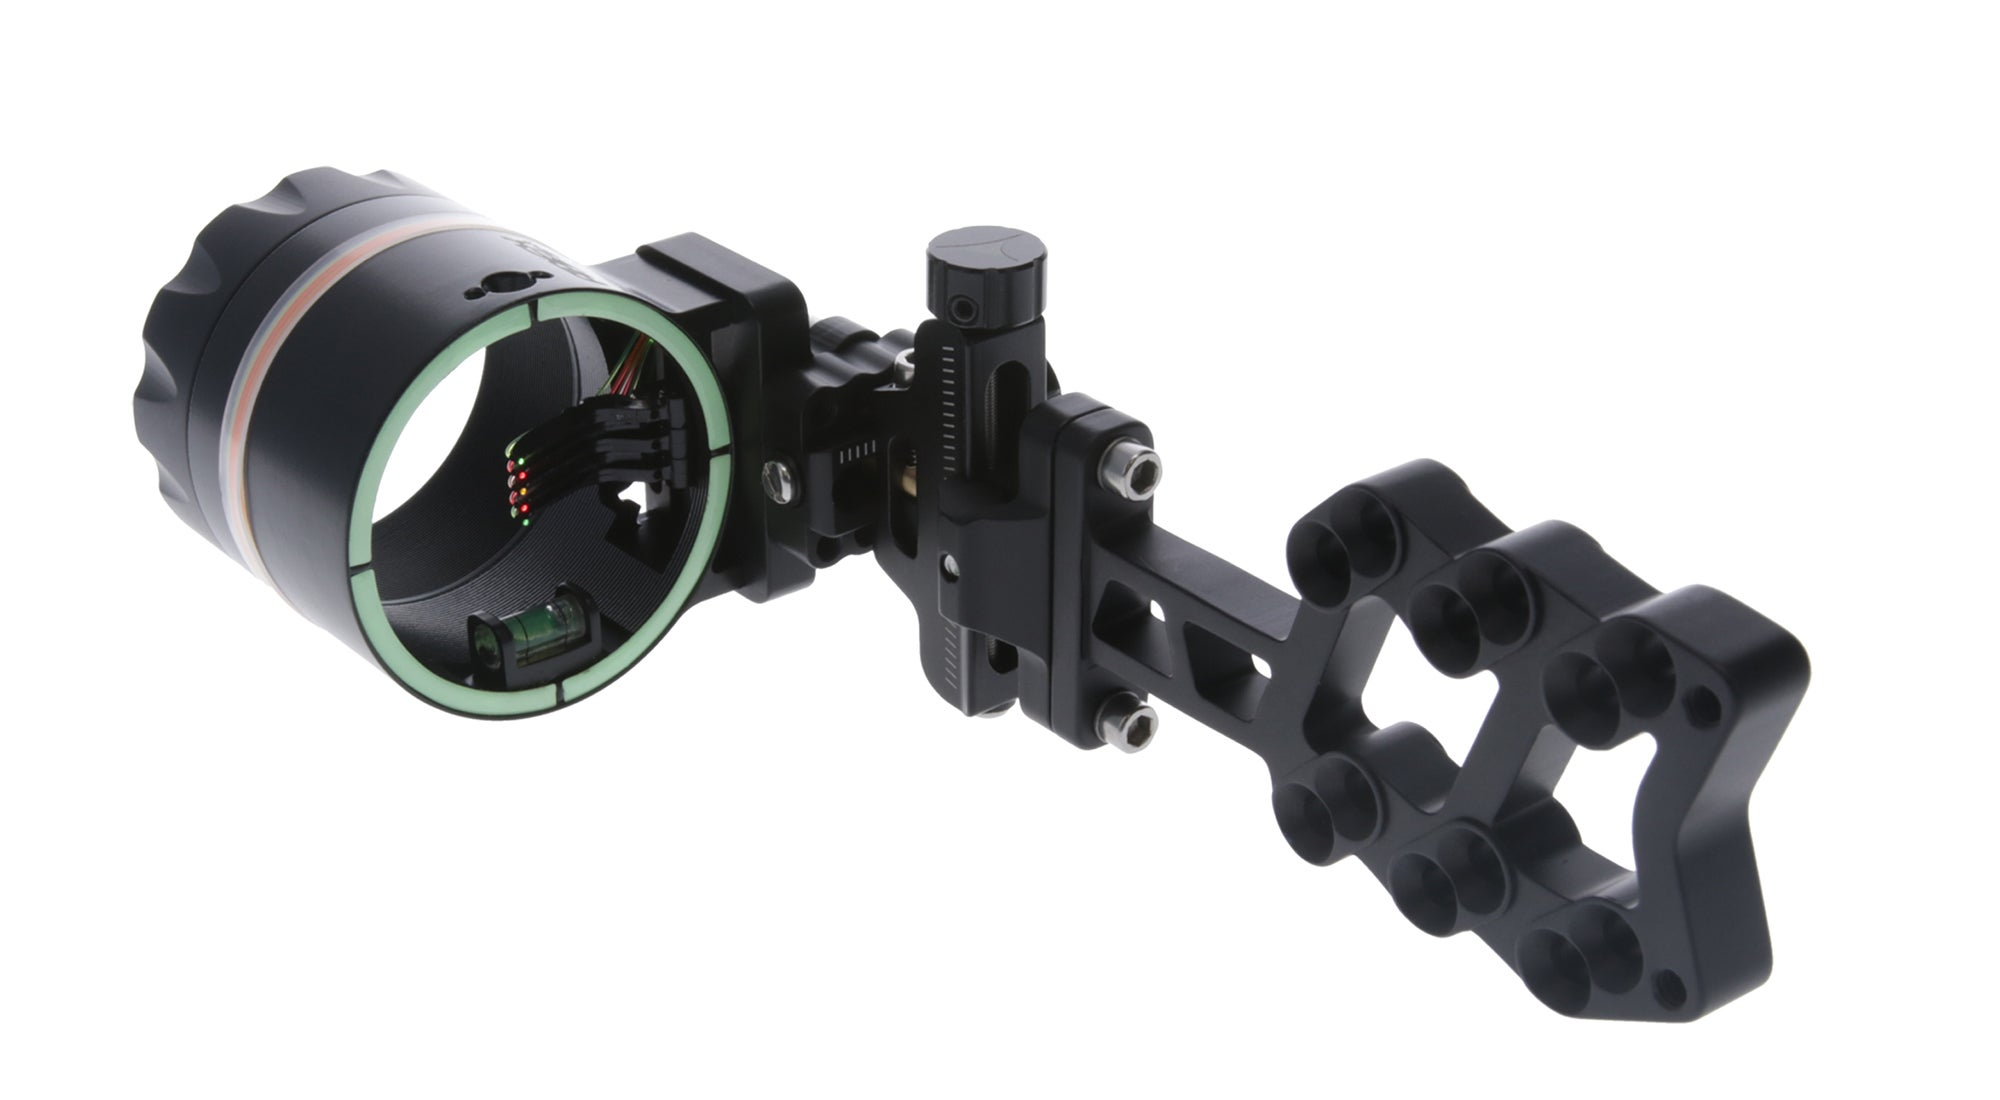 Apex Magnitude bow sight